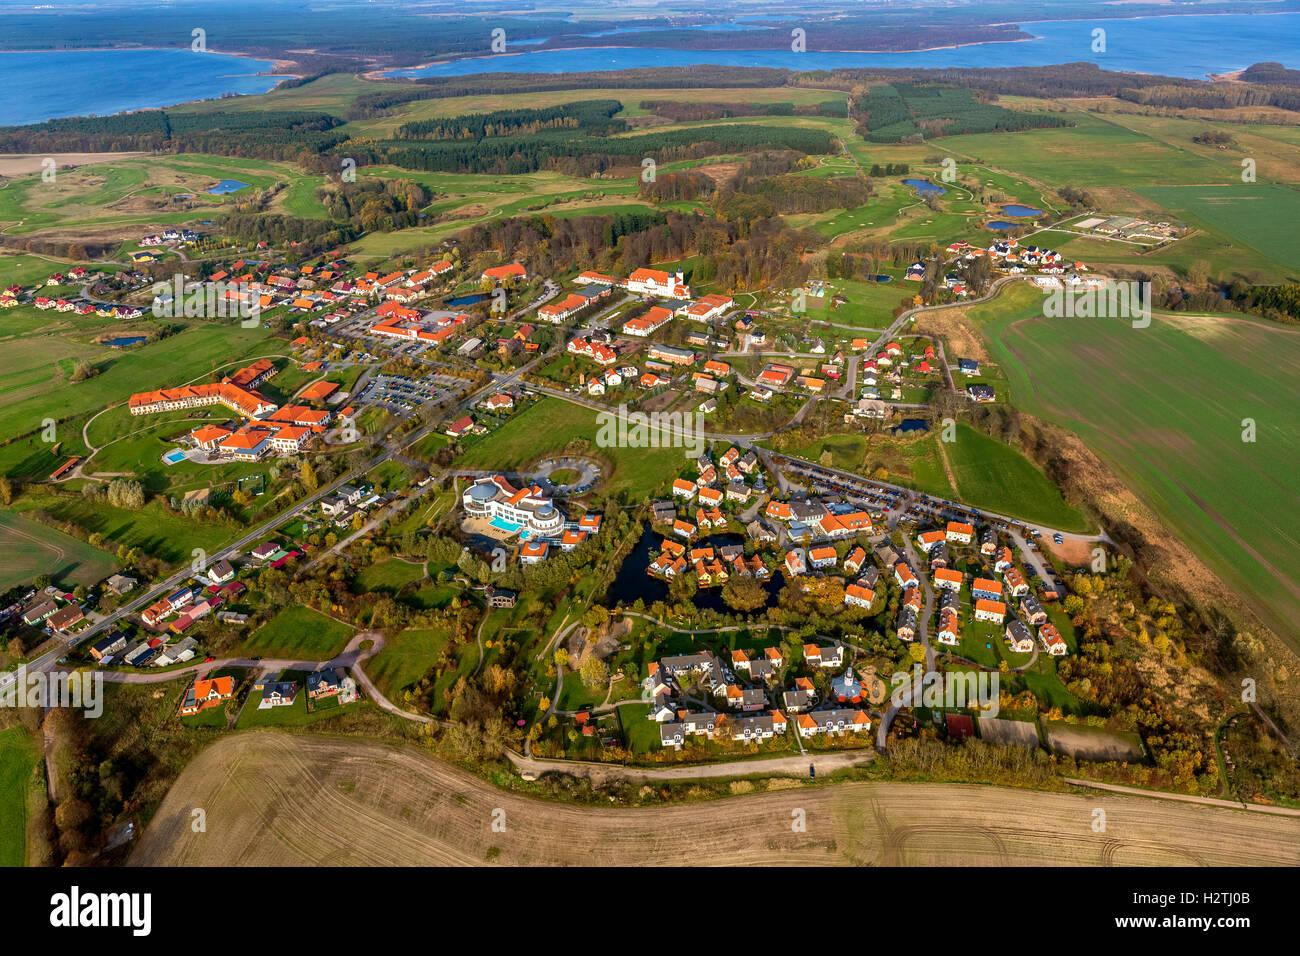 Aerial picture, Radisson Blu Resort castle Fleesensee, Scandinavian golf club with Göhren-Lebbin, Müritz - Stock Image